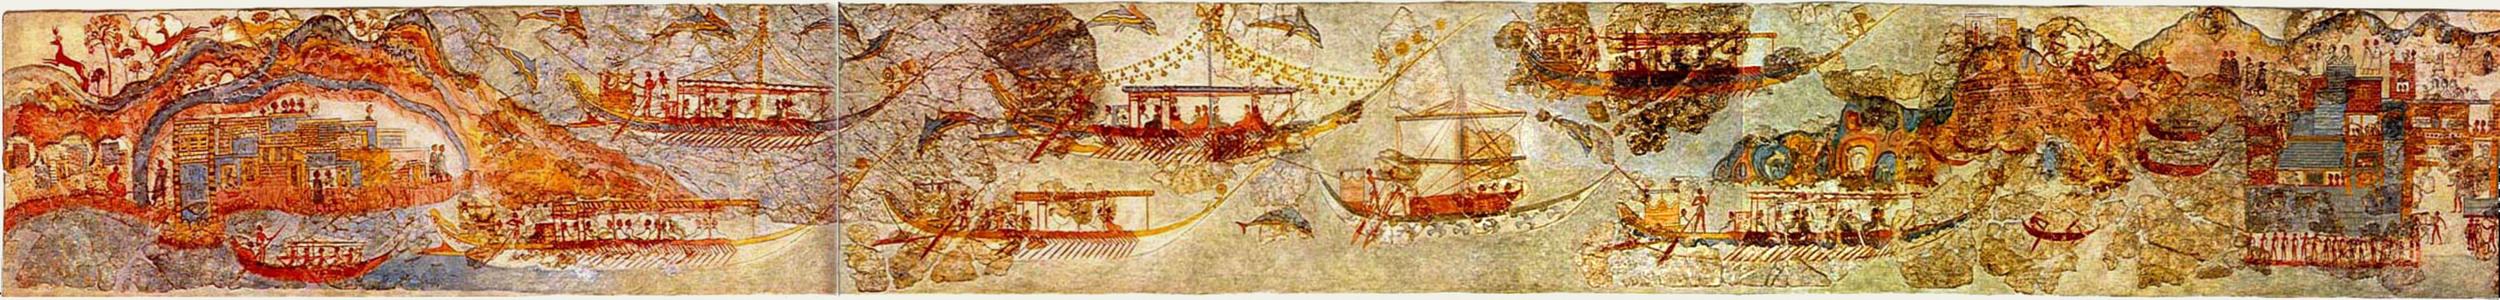 Ship Fresco, Akrotiri, Santorini   By pano by smial - Own work, Public Domain